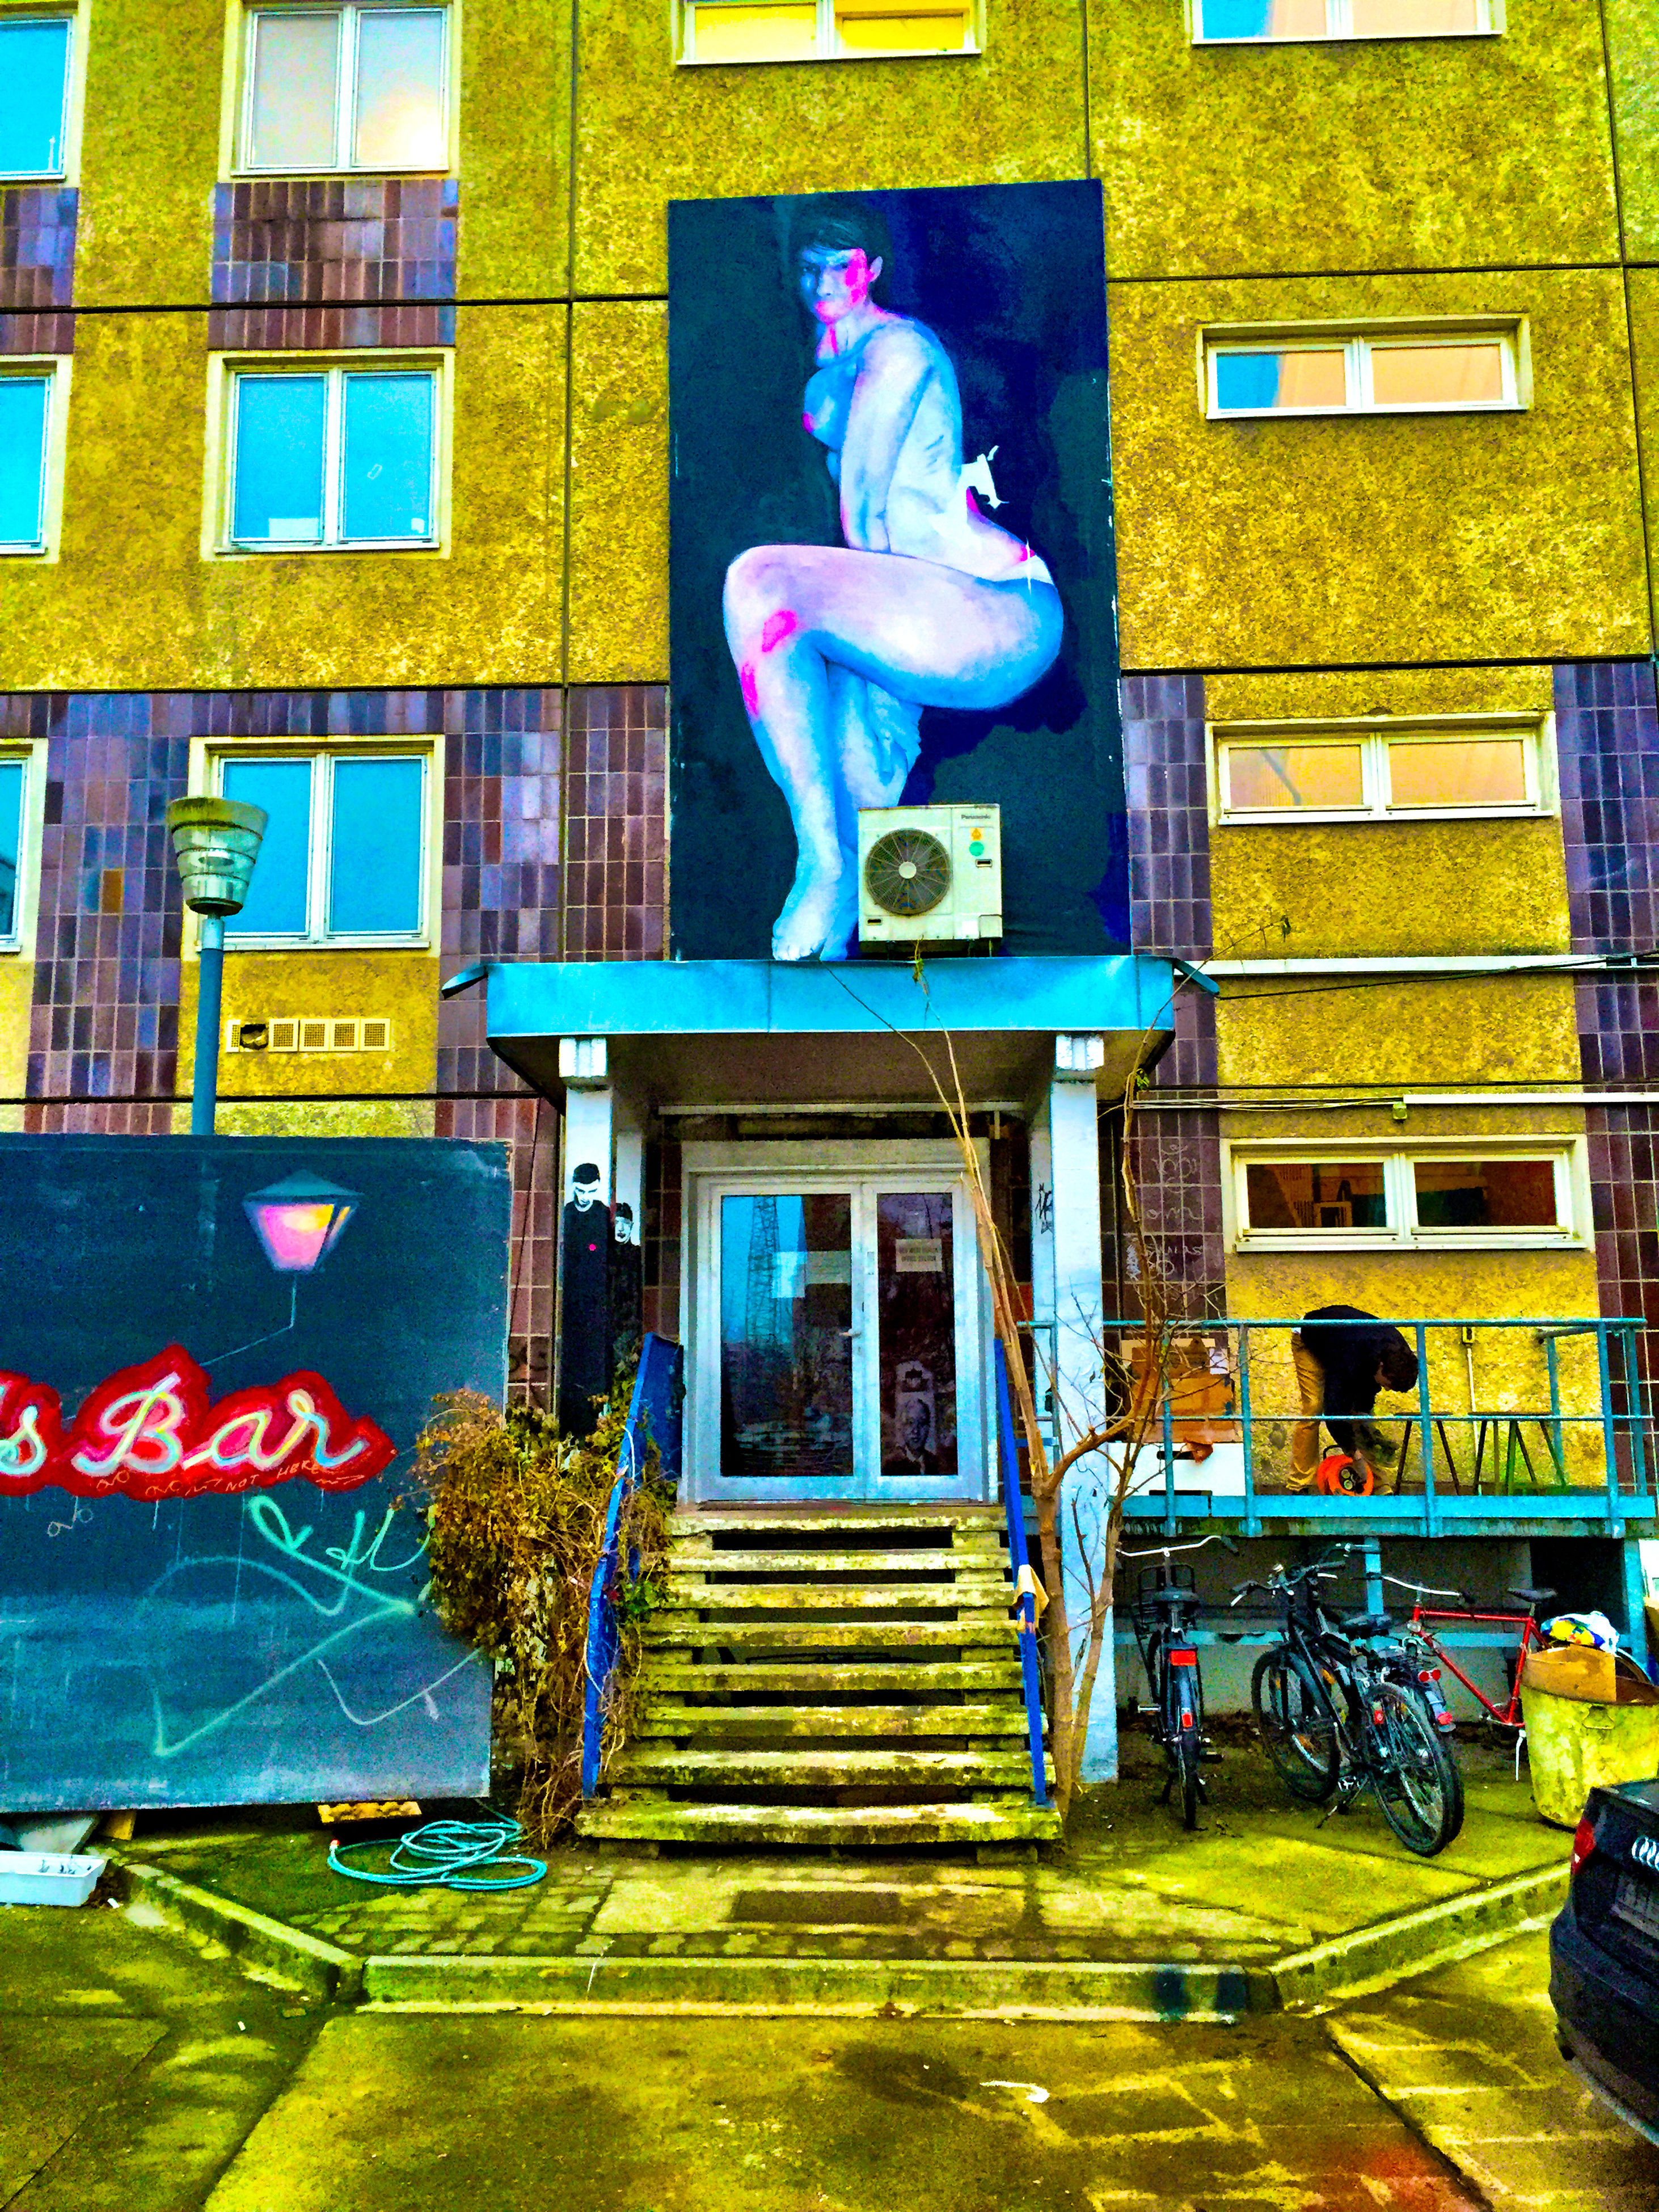 human representation, art, art and craft, creativity, statue, sculpture, built structure, architecture, building exterior, animal representation, graffiti, multi colored, full length, outdoors, building, craft